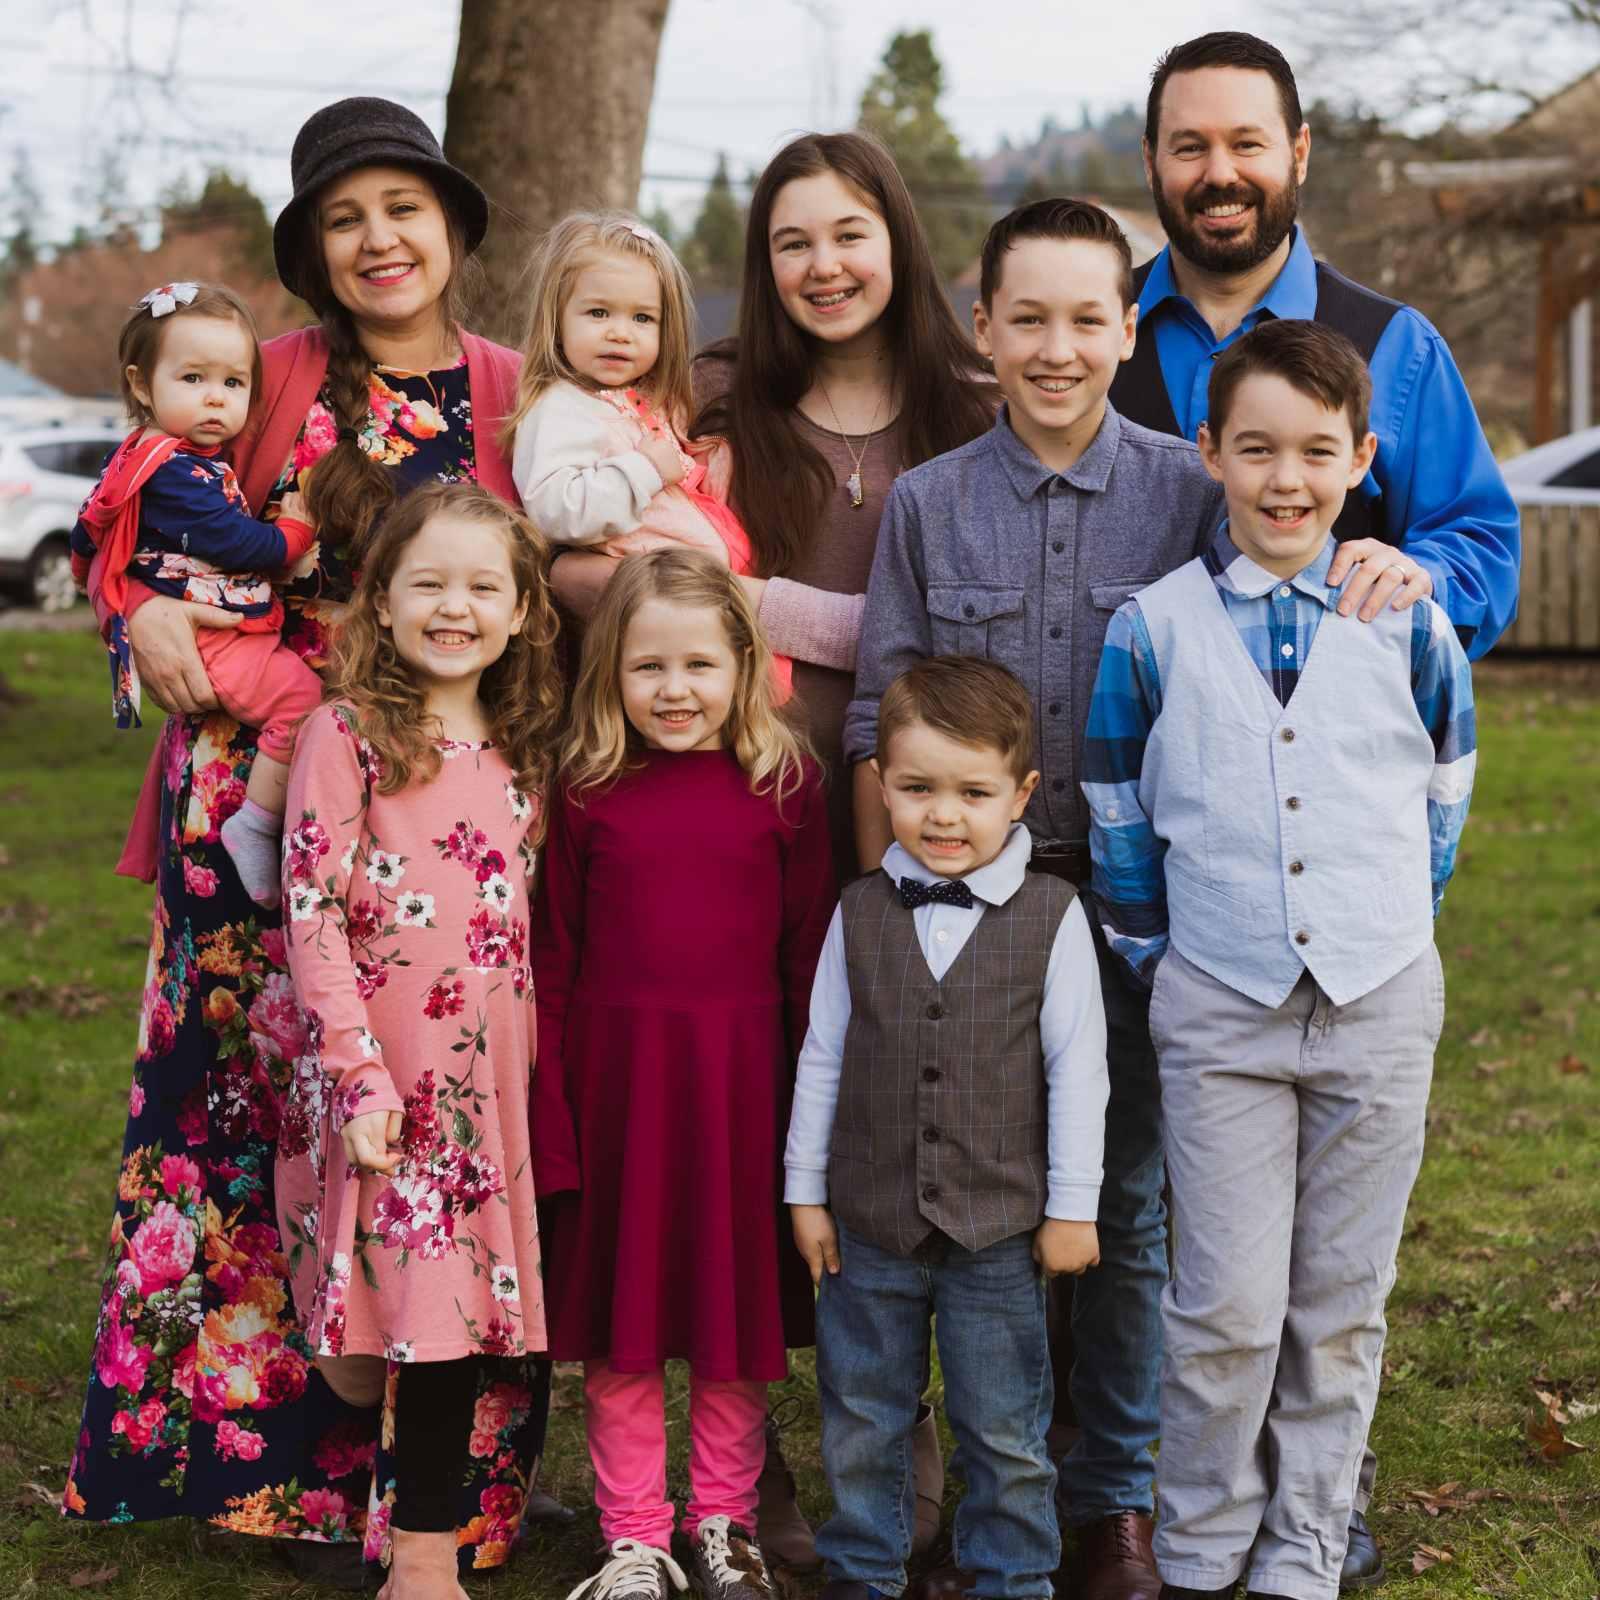 Pastor Scott LaPierre and family